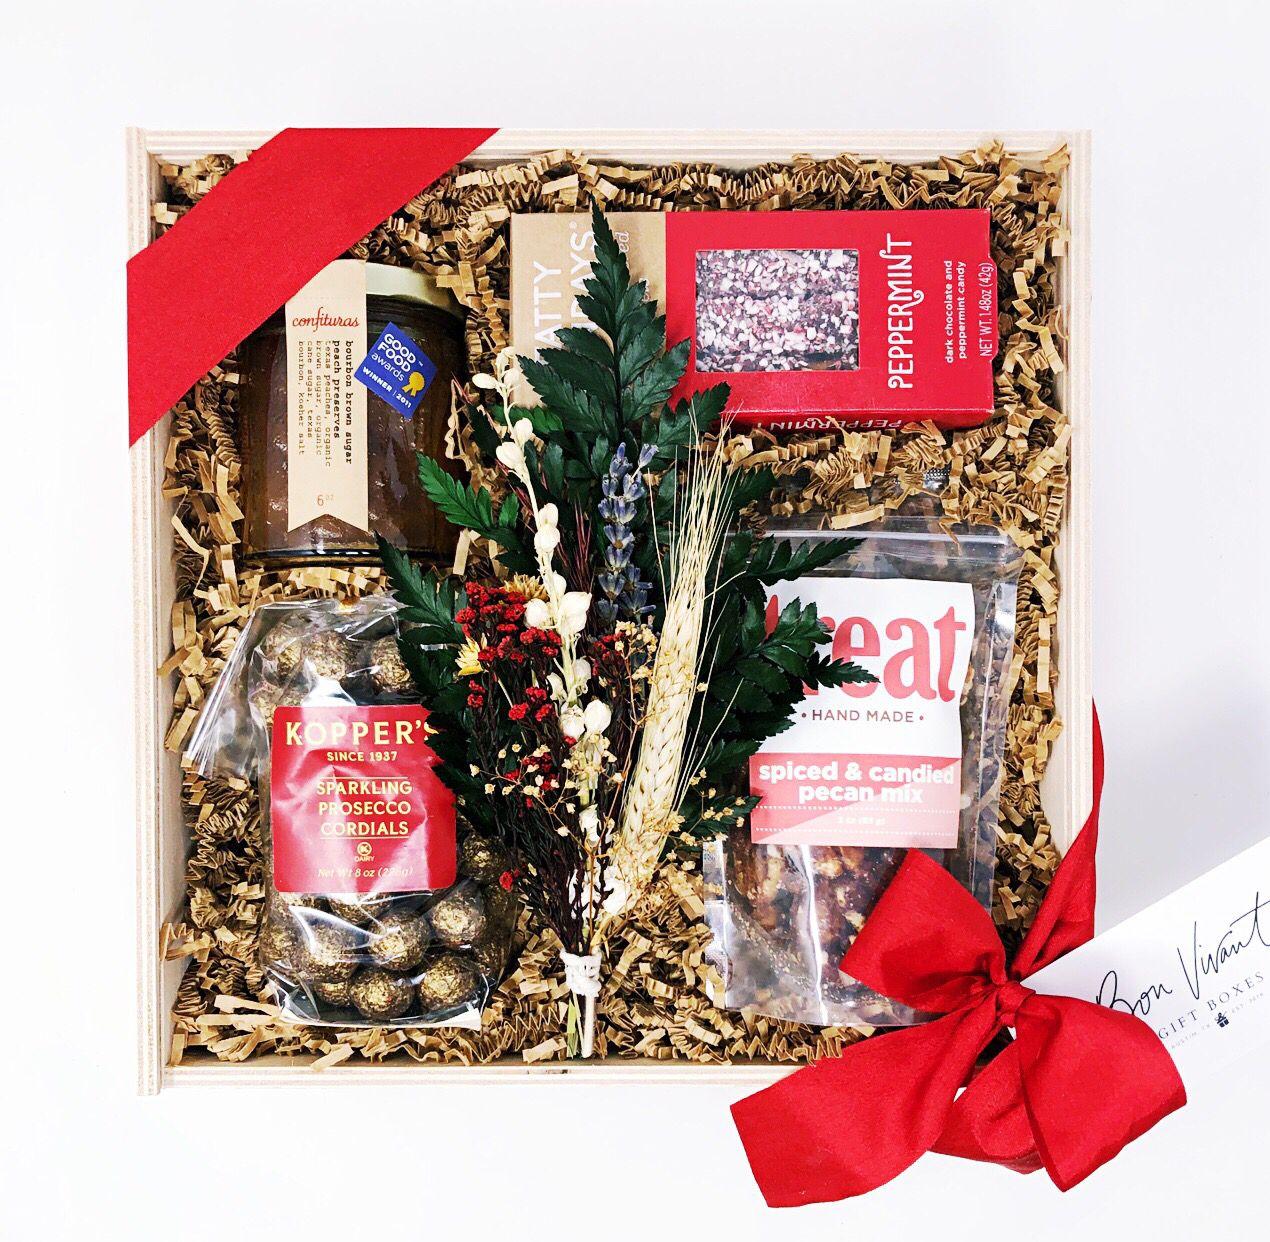 bon vivant gift boxes giang sinh giỏ qua bon vivant gift boxes giang sinh giỏ qua